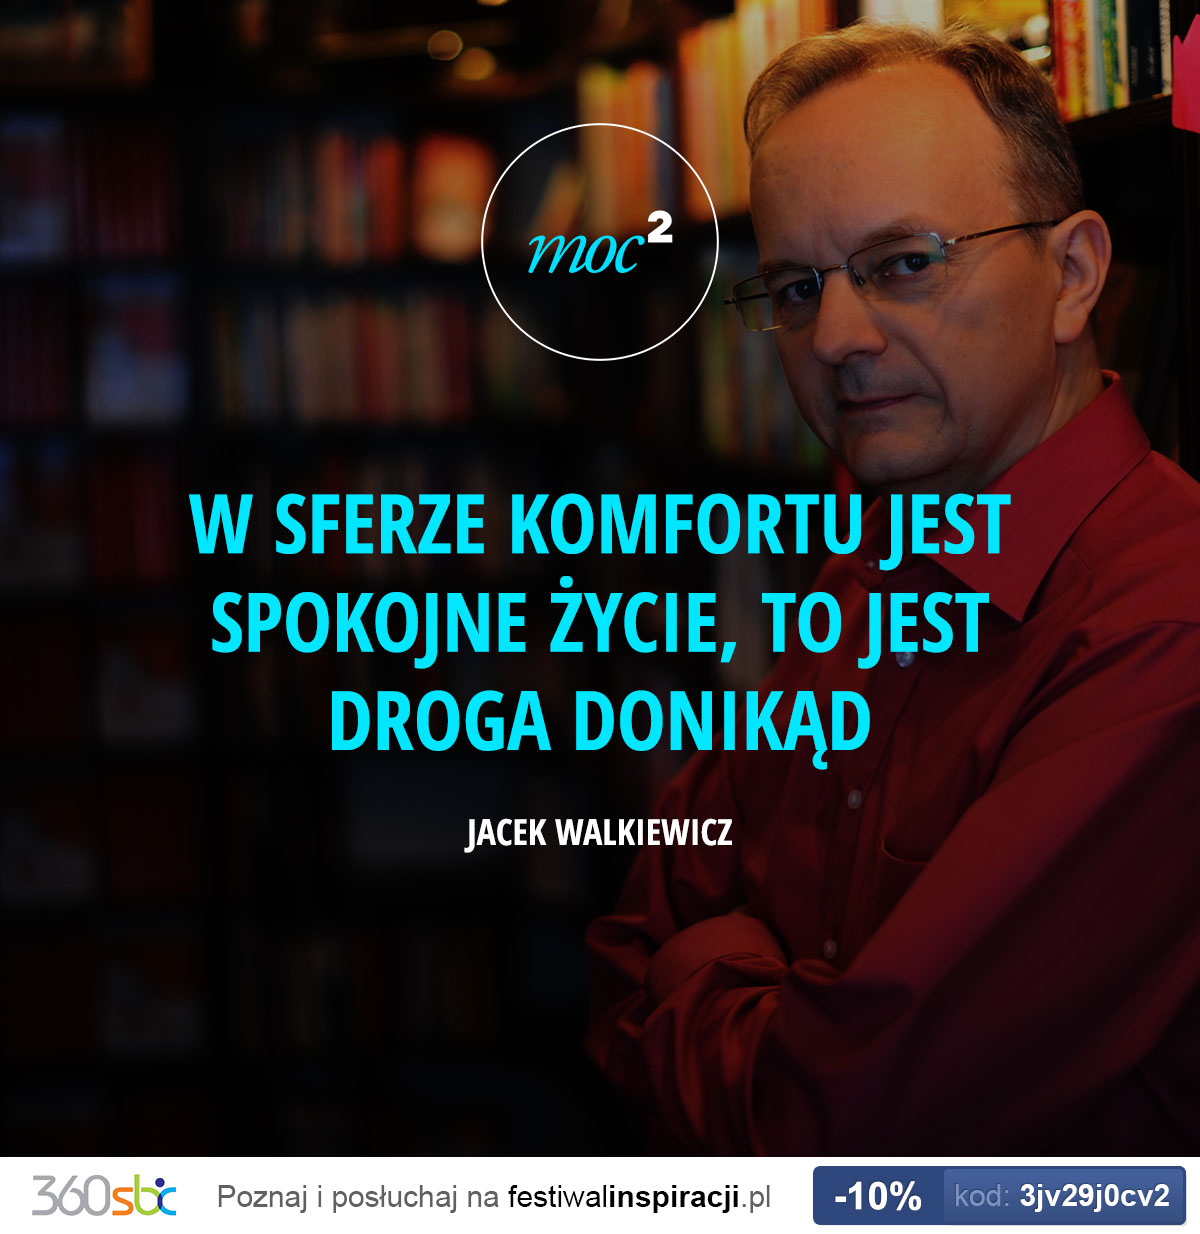 Jacek walkiewicz adres e mail